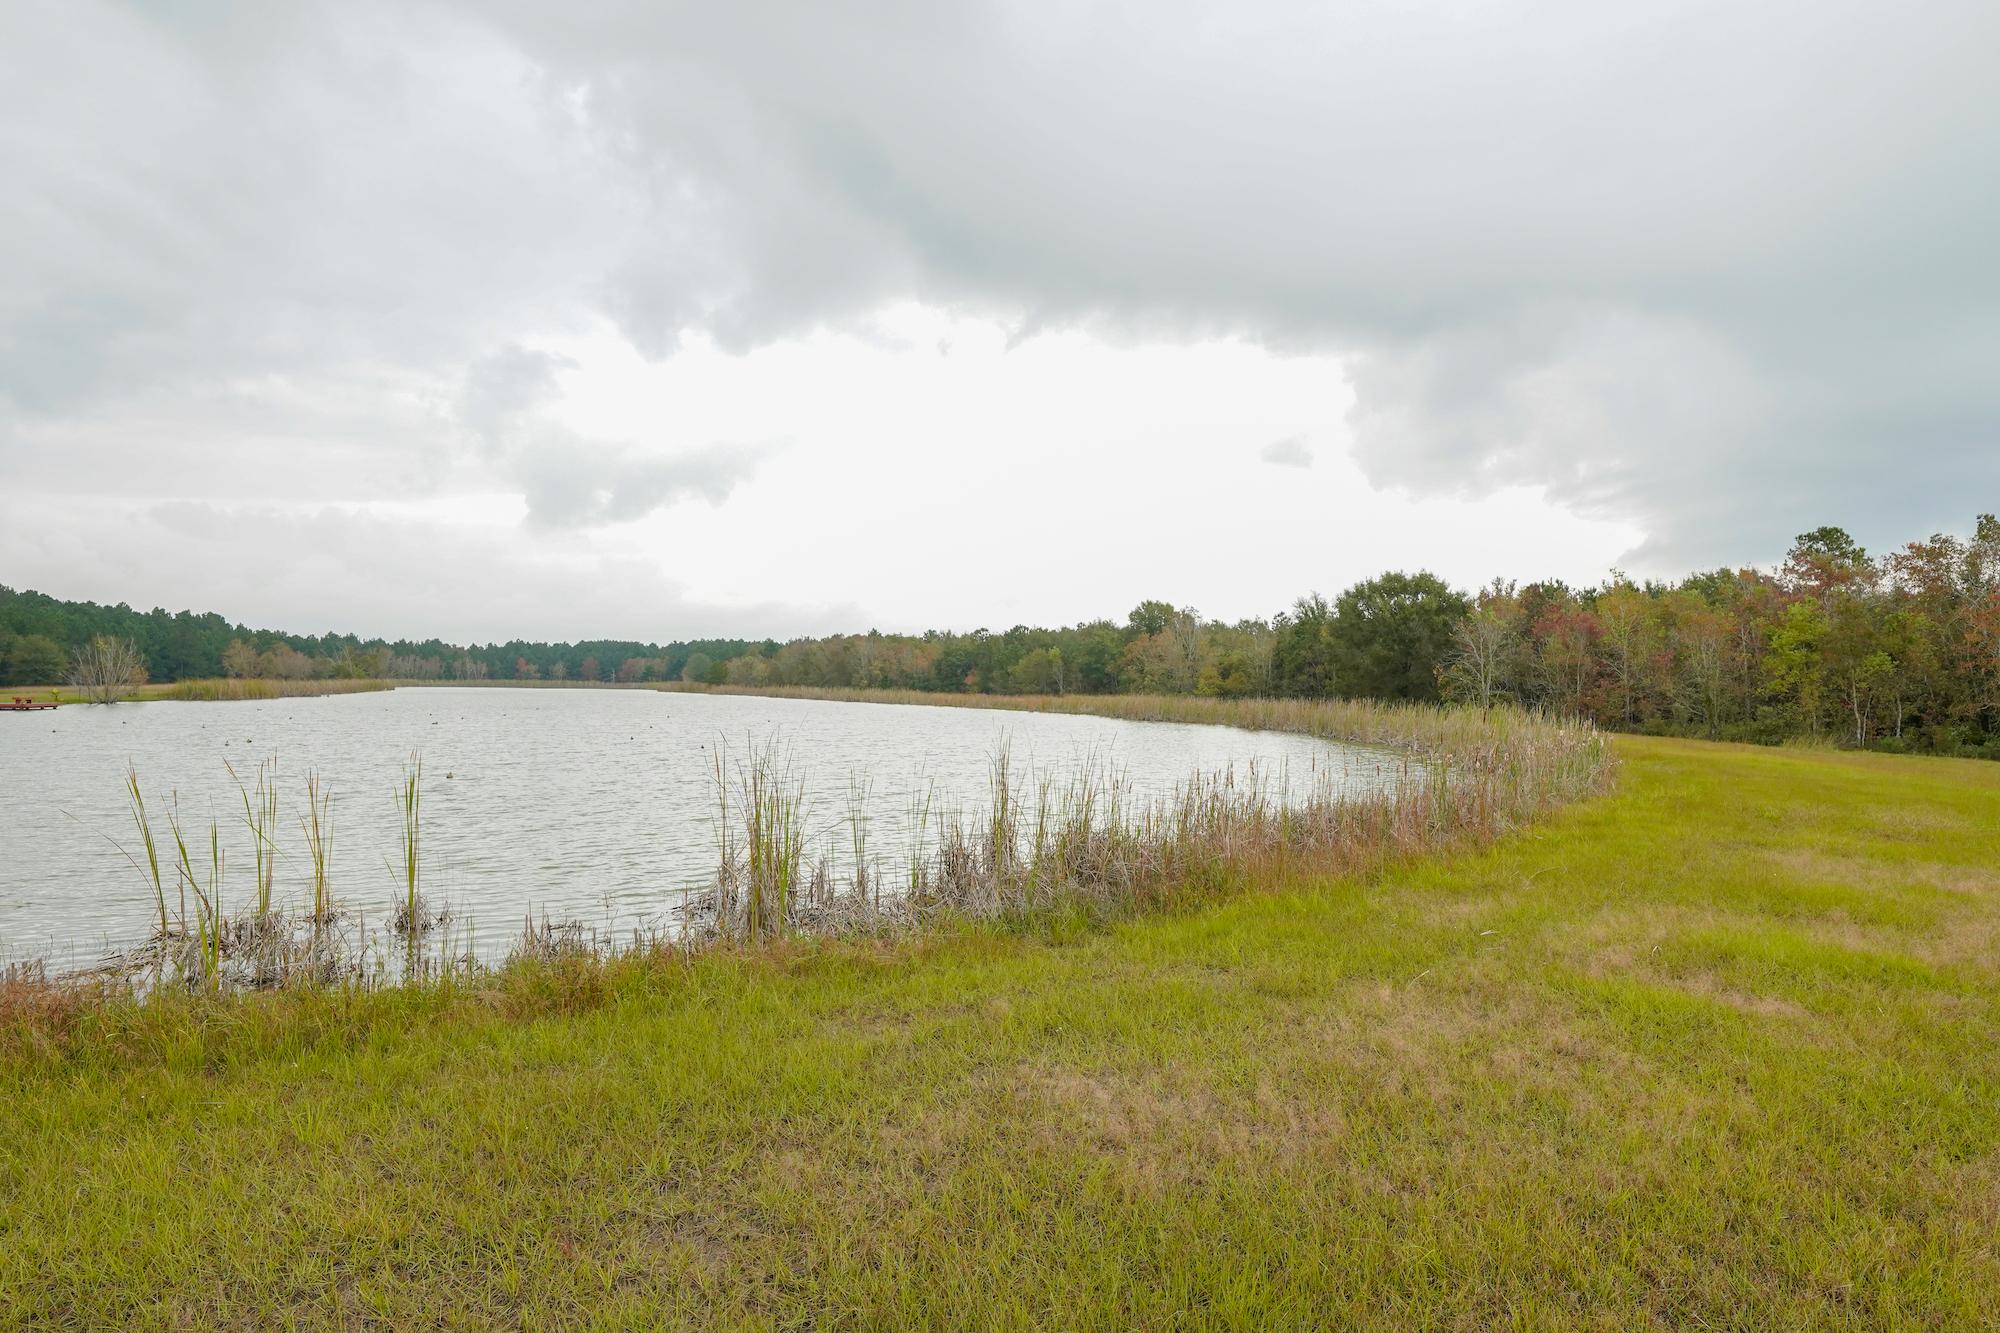 Jefferson County Development Land - Image 16 of 36